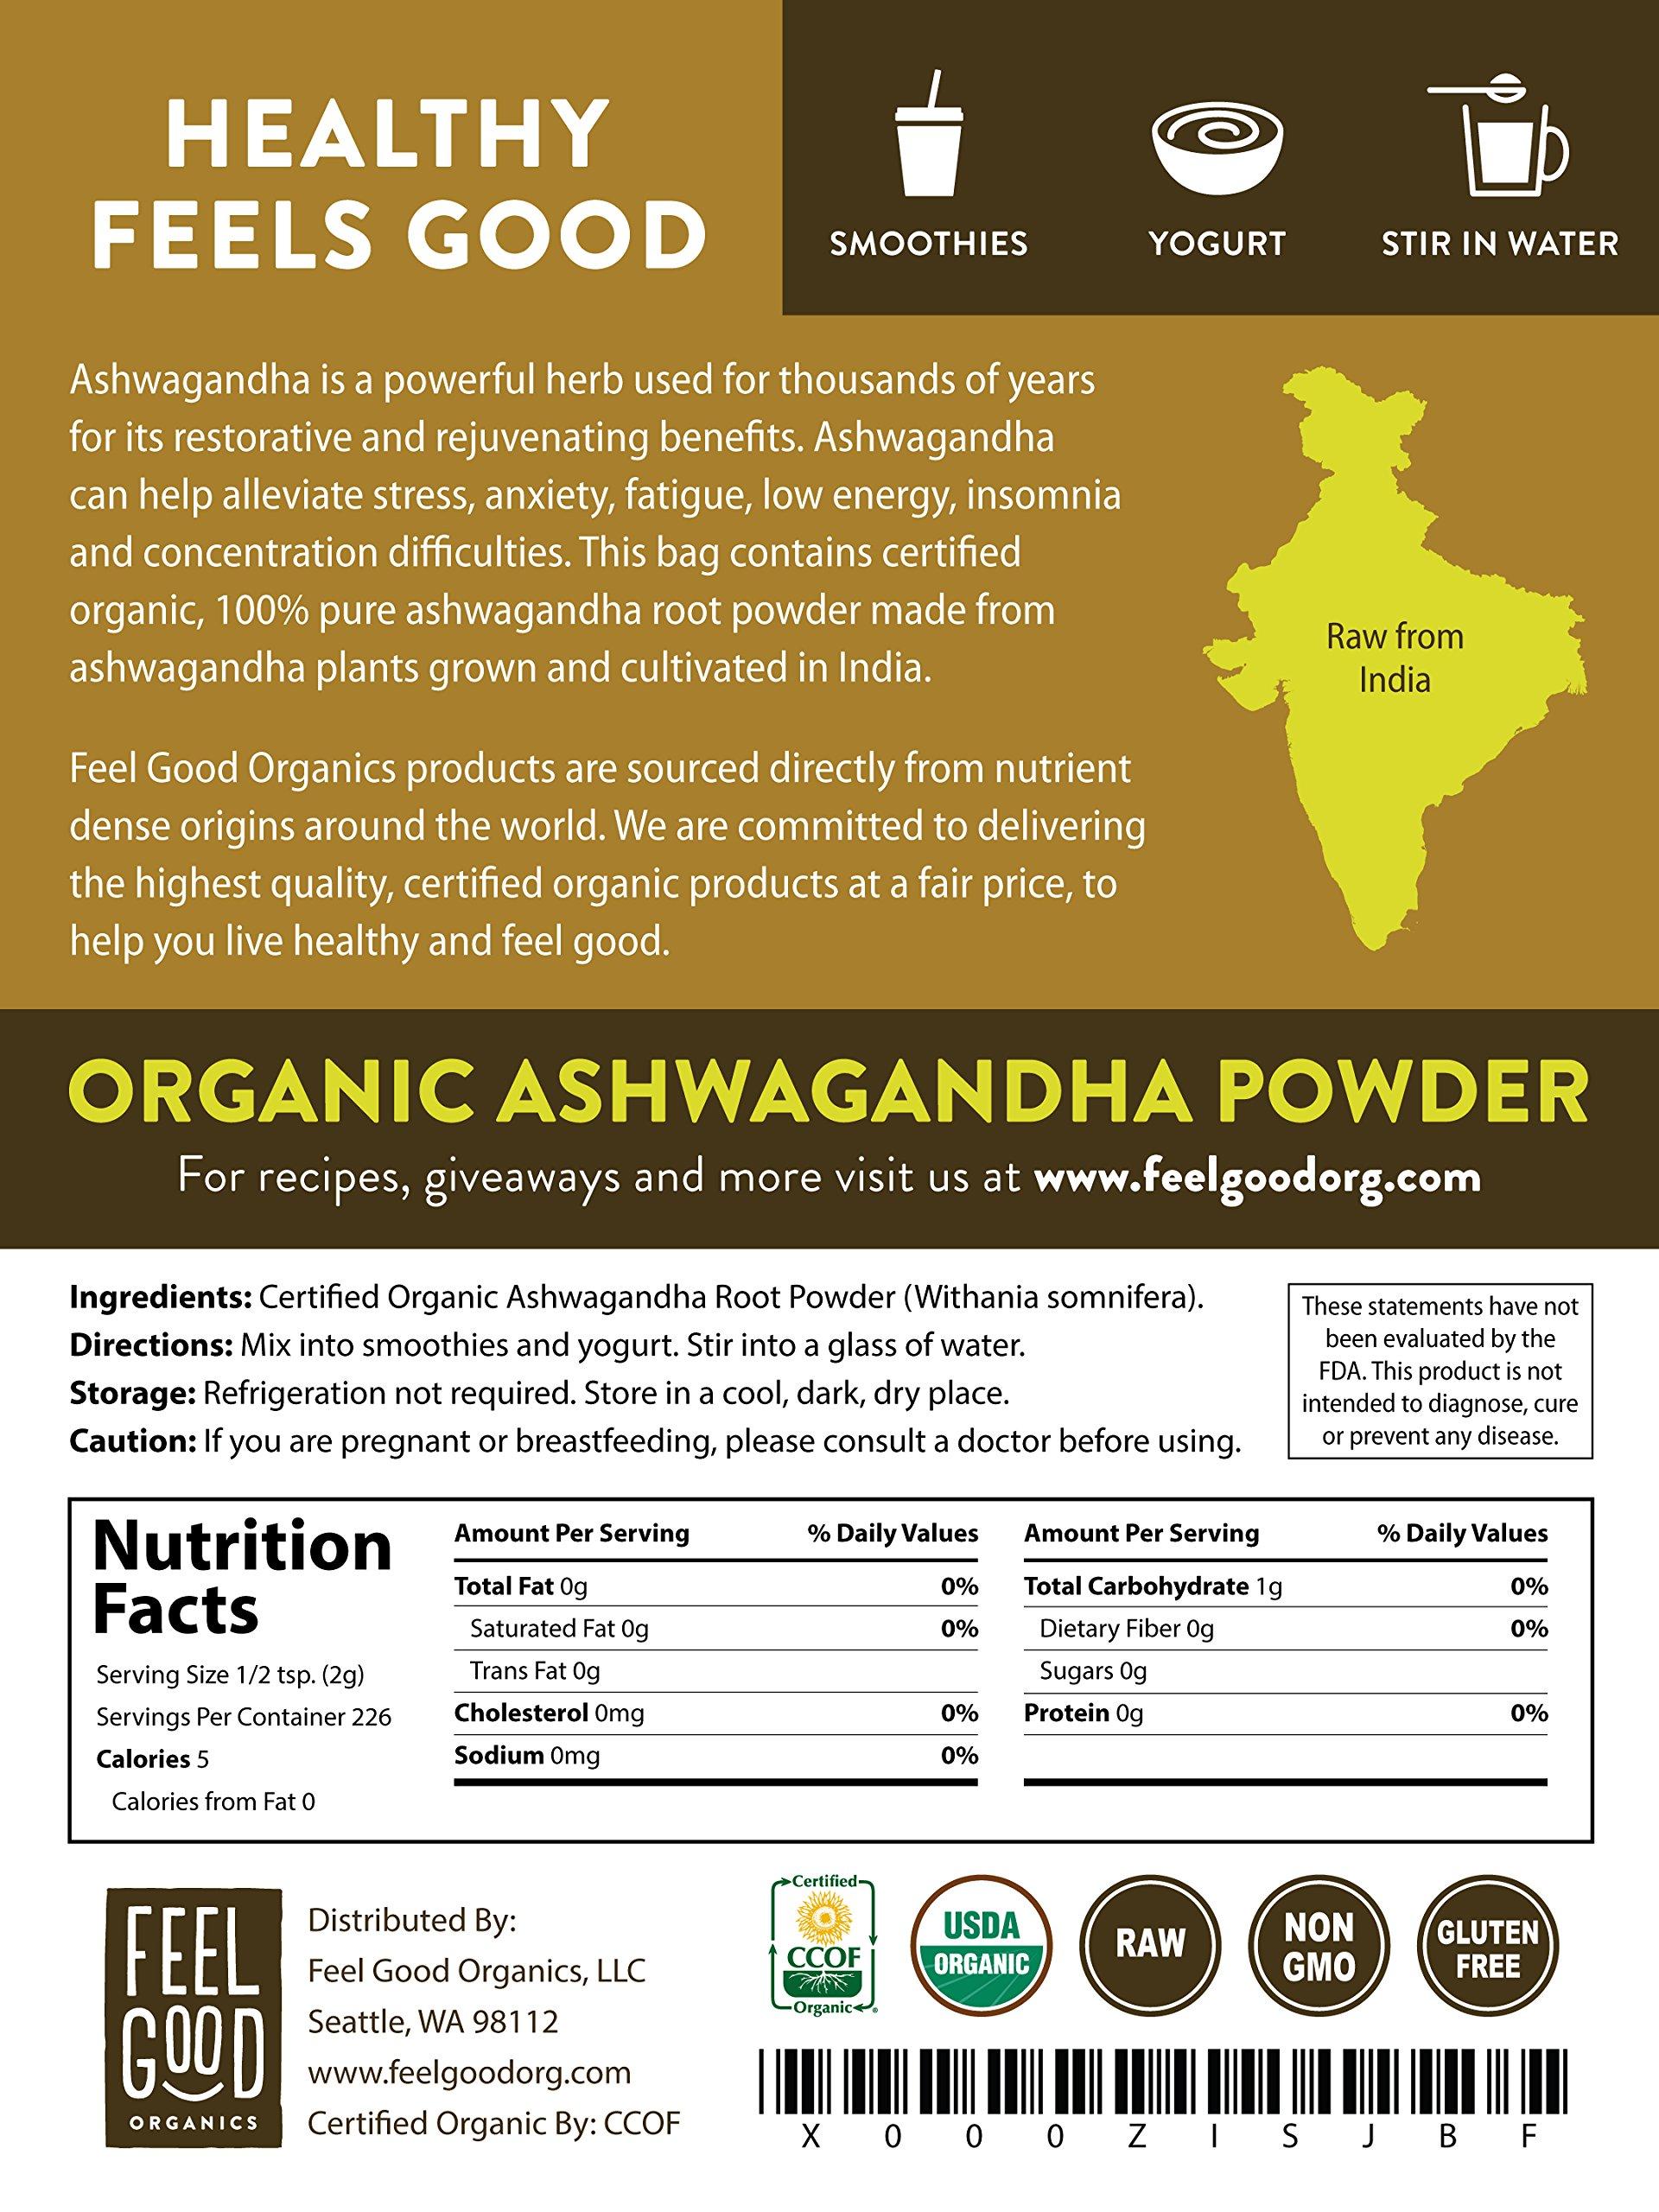 Organic Ashwagandha Root Powder - 16oz Resealable Bag (1lb) - 100% Raw From India - by Feel Good Organics by Feel Good Organics (Image #3)